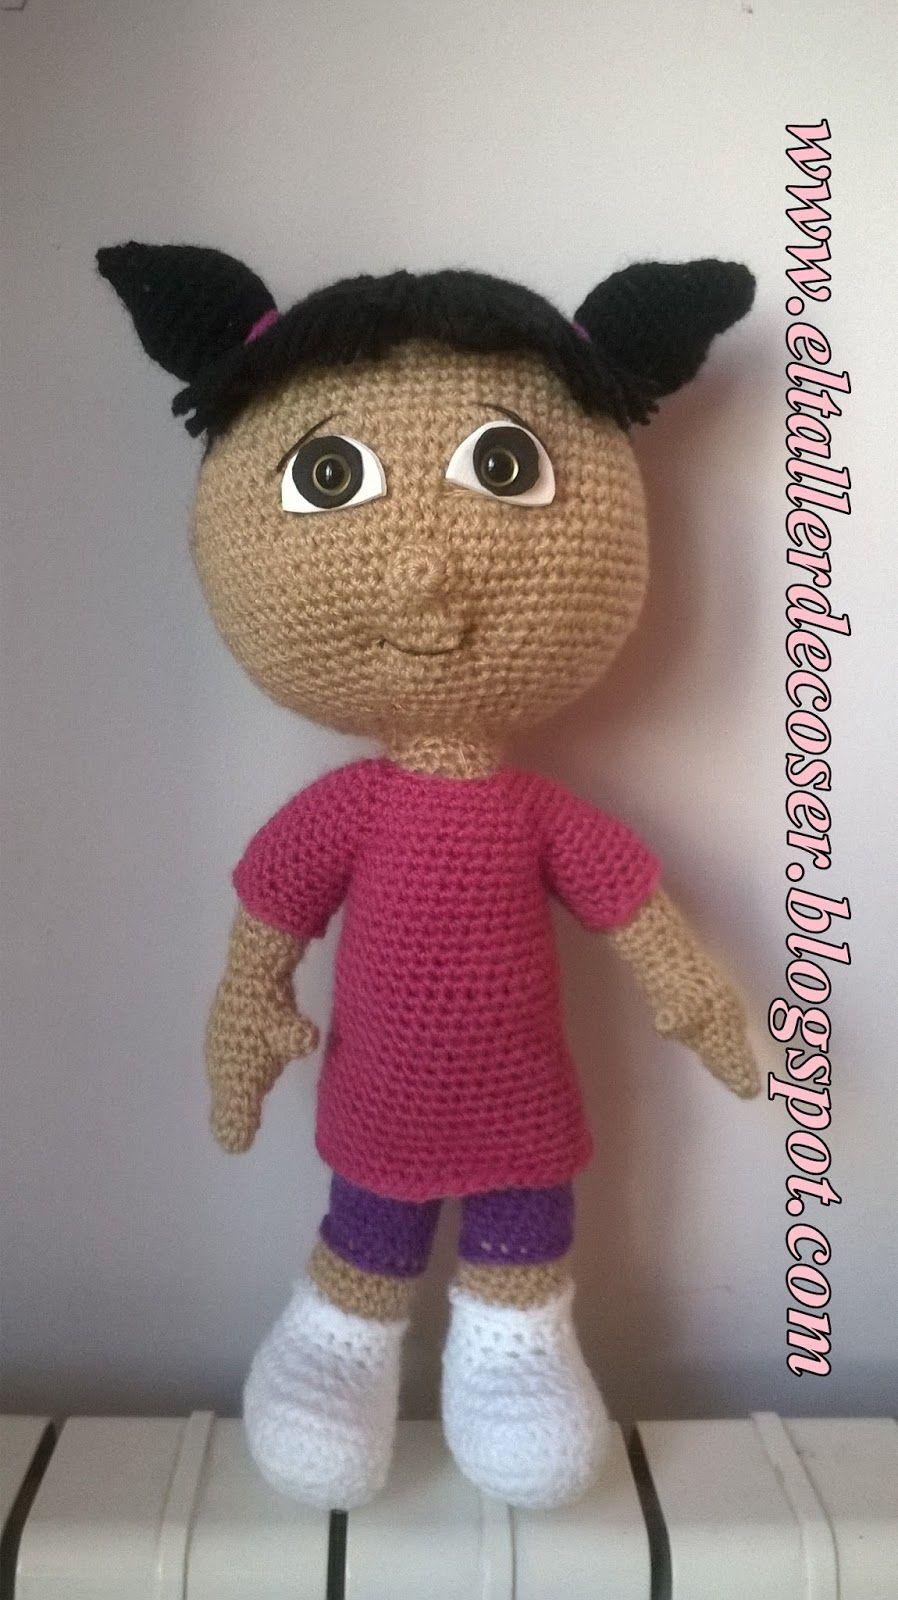 Amigurumi | Boo 👧🏽 from Monsters Inc Crochet Pencil Topper ... | 1600x898